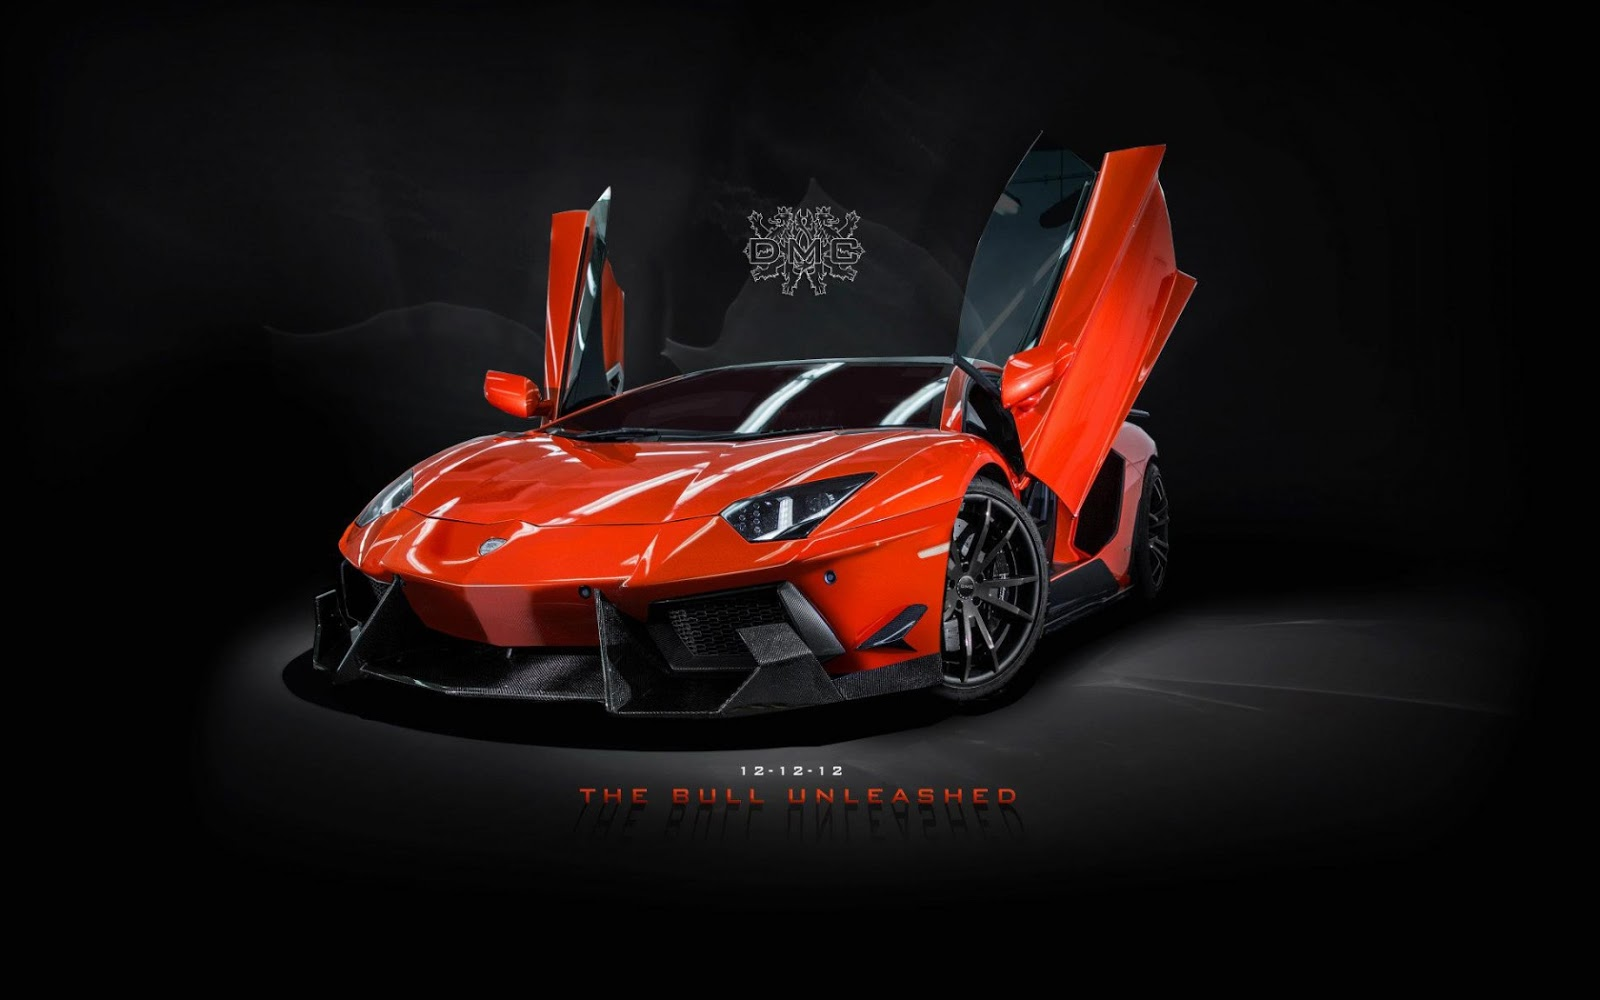 http://2.bp.blogspot.com/-hj-AP0wxVMk/UWxS984oIzI/AAAAAAAAARA/rOnfdltPcjY/s1600/Lamborghini+aventador+lp900+sv+5+1680x1050.jpg